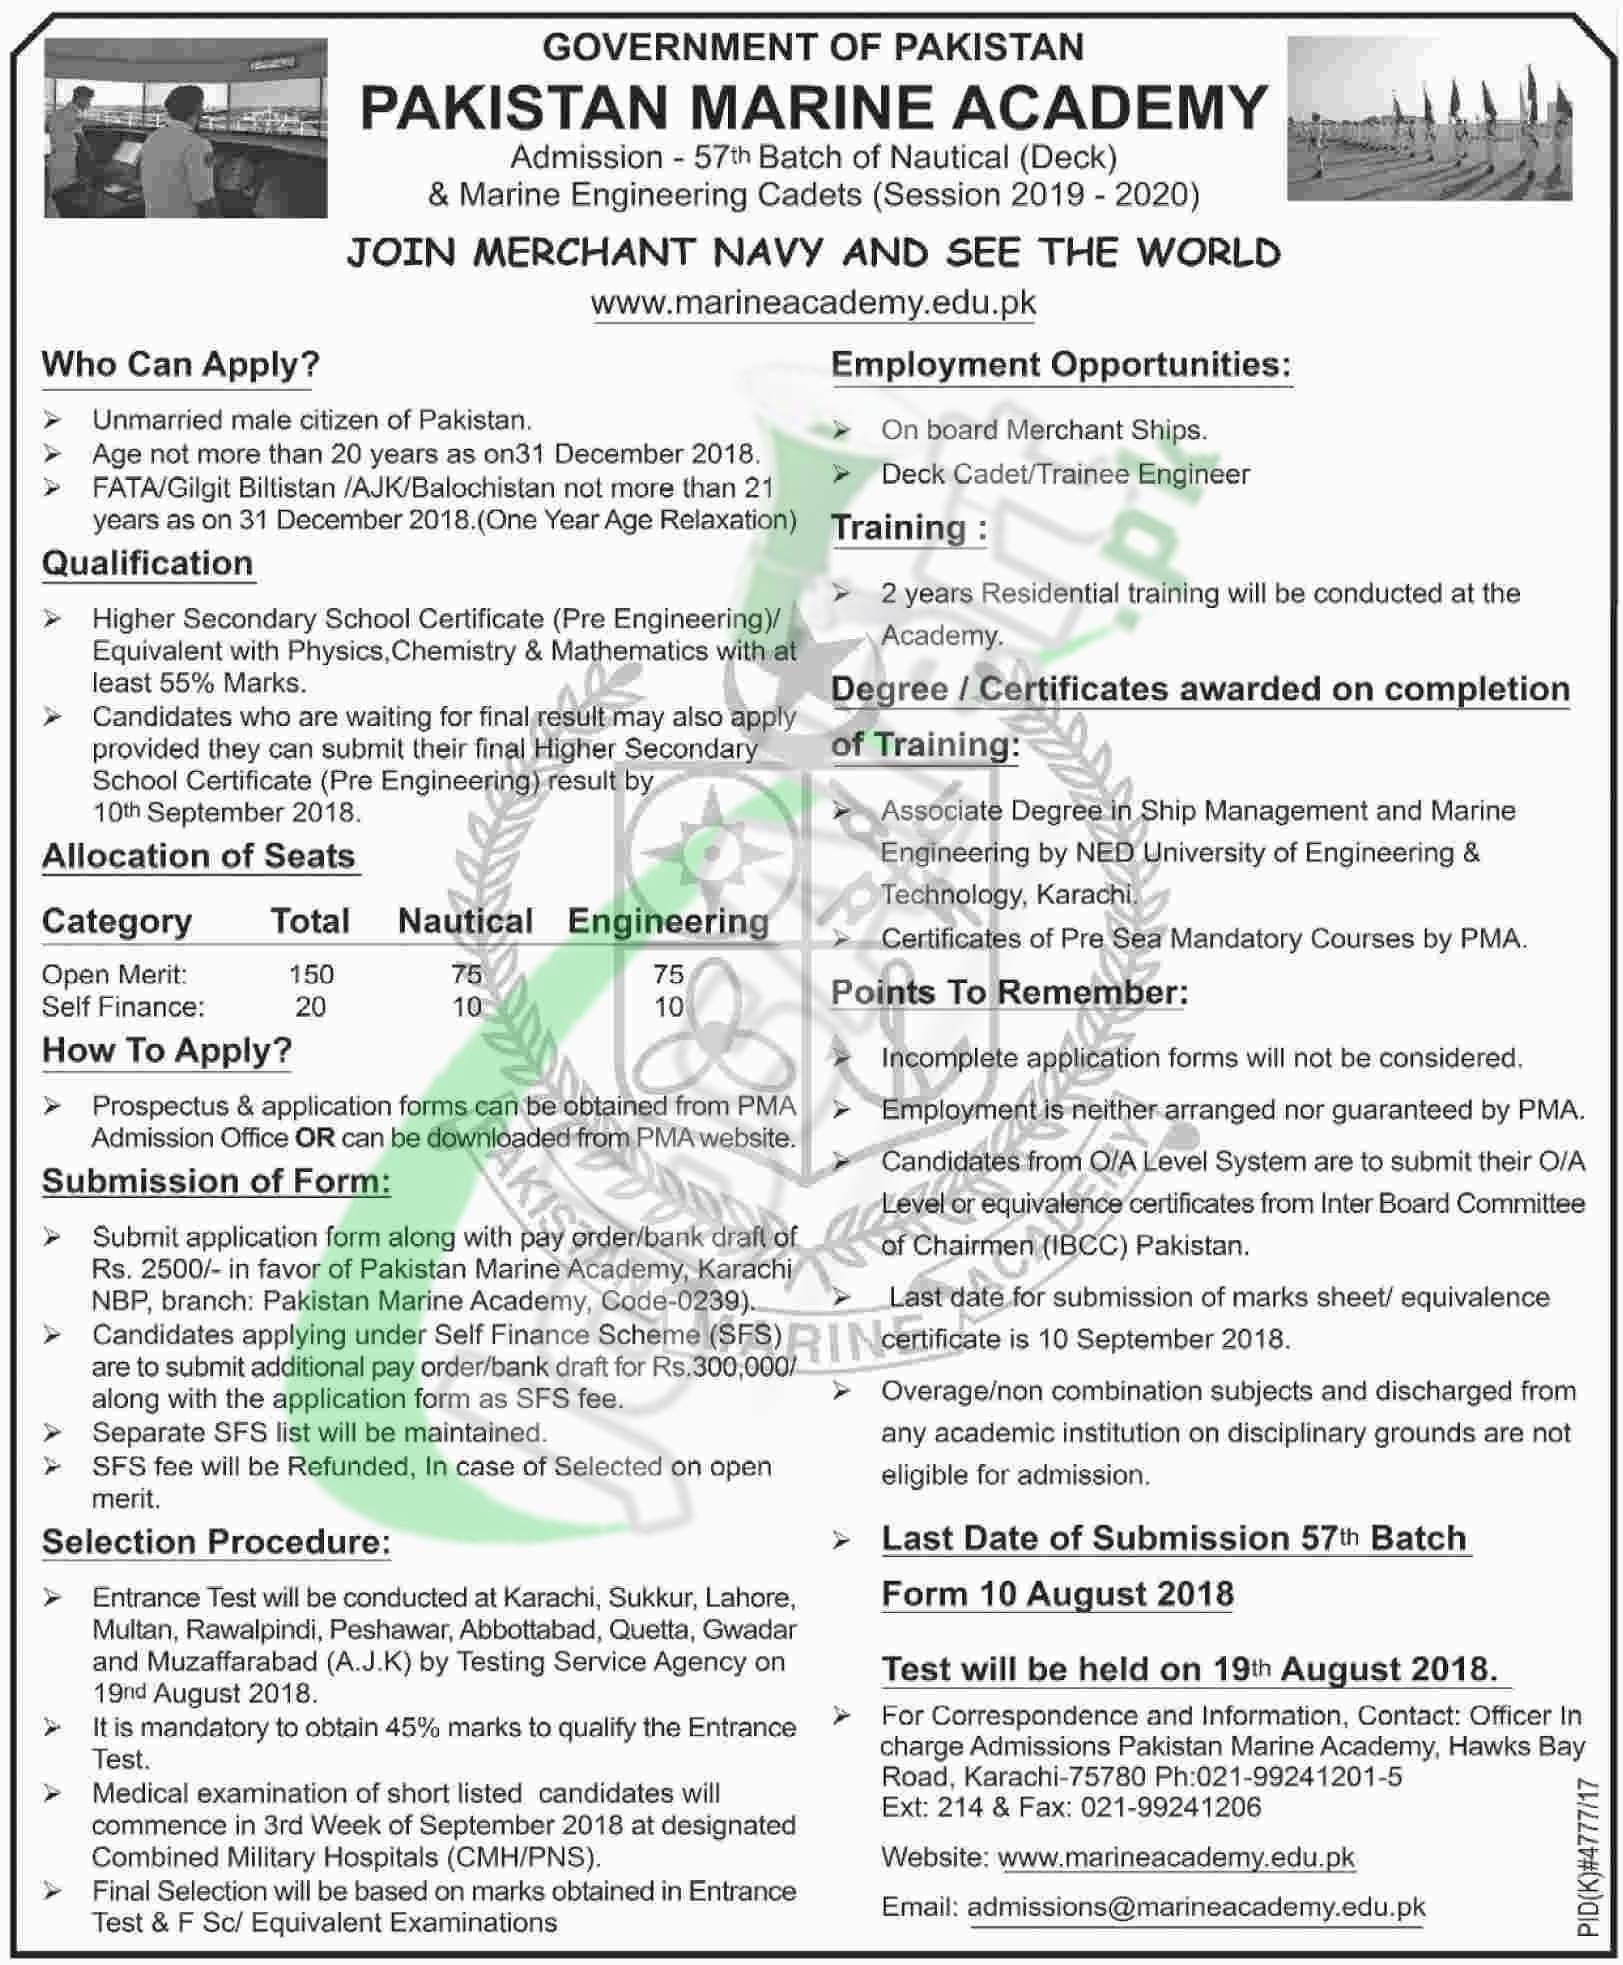 Pakistan Marine Academy Admission 2018